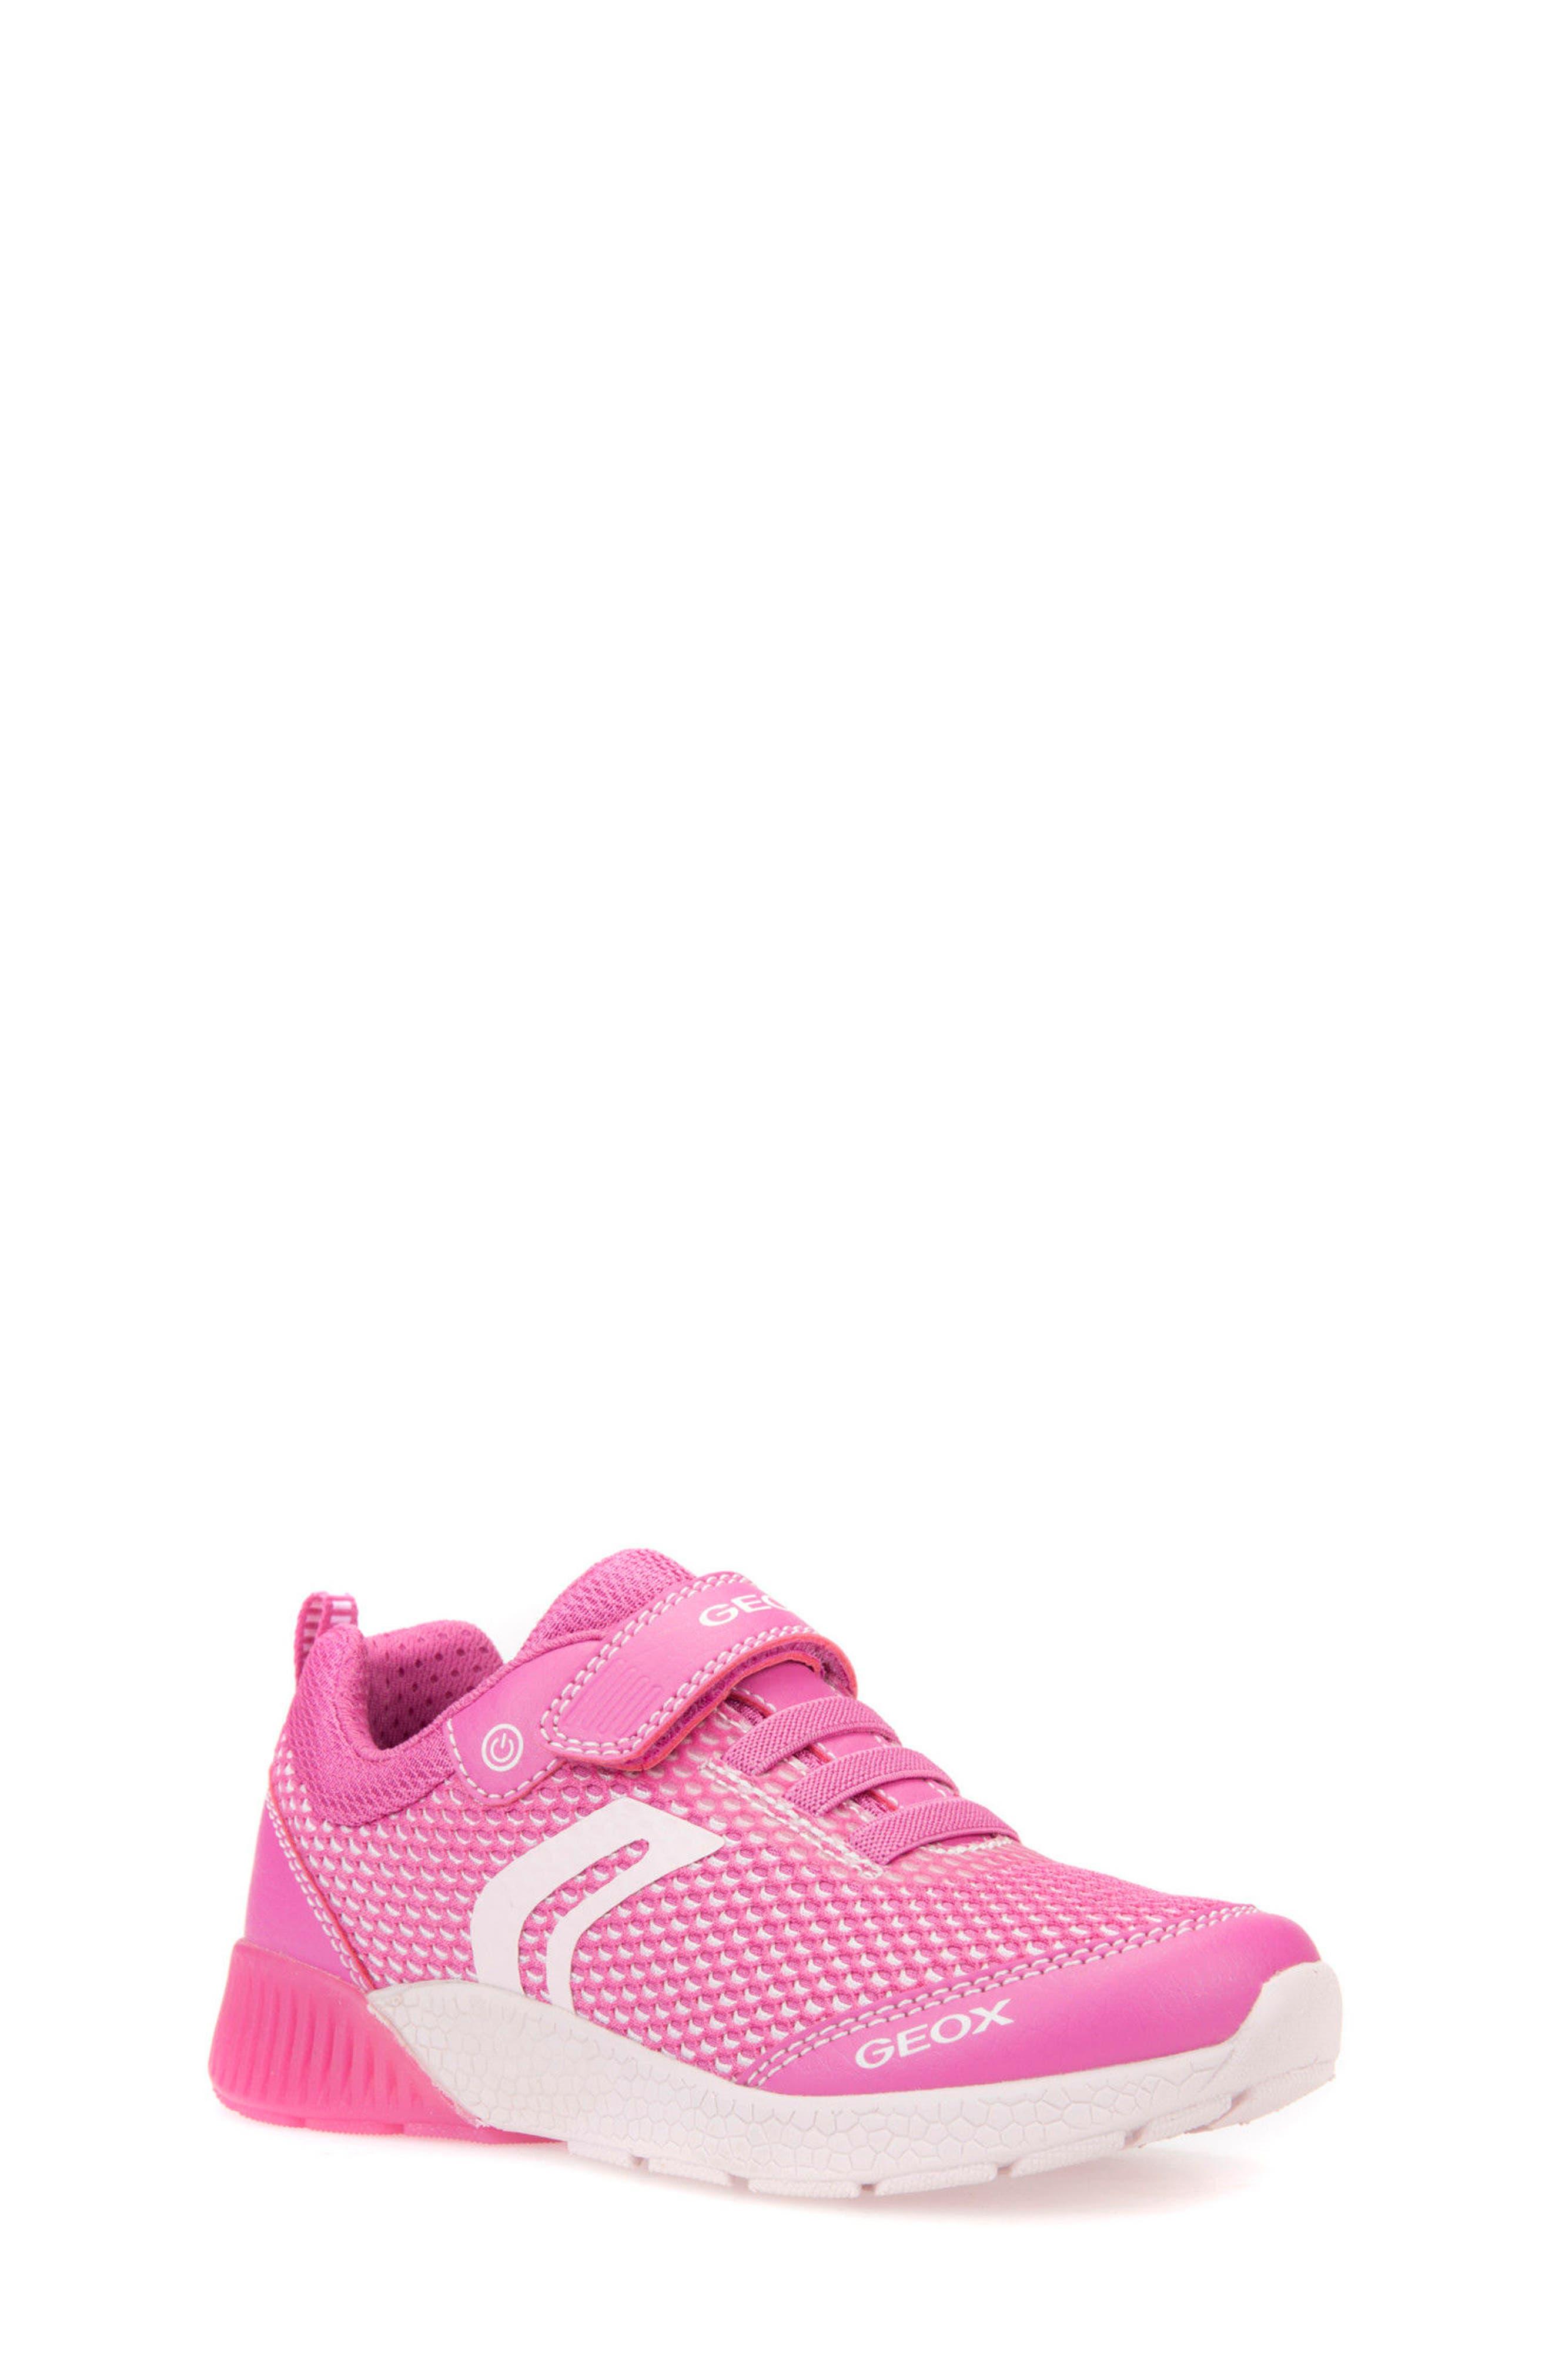 Sveth Light-Up Sneaker,                             Main thumbnail 1, color,                             Fuchsia